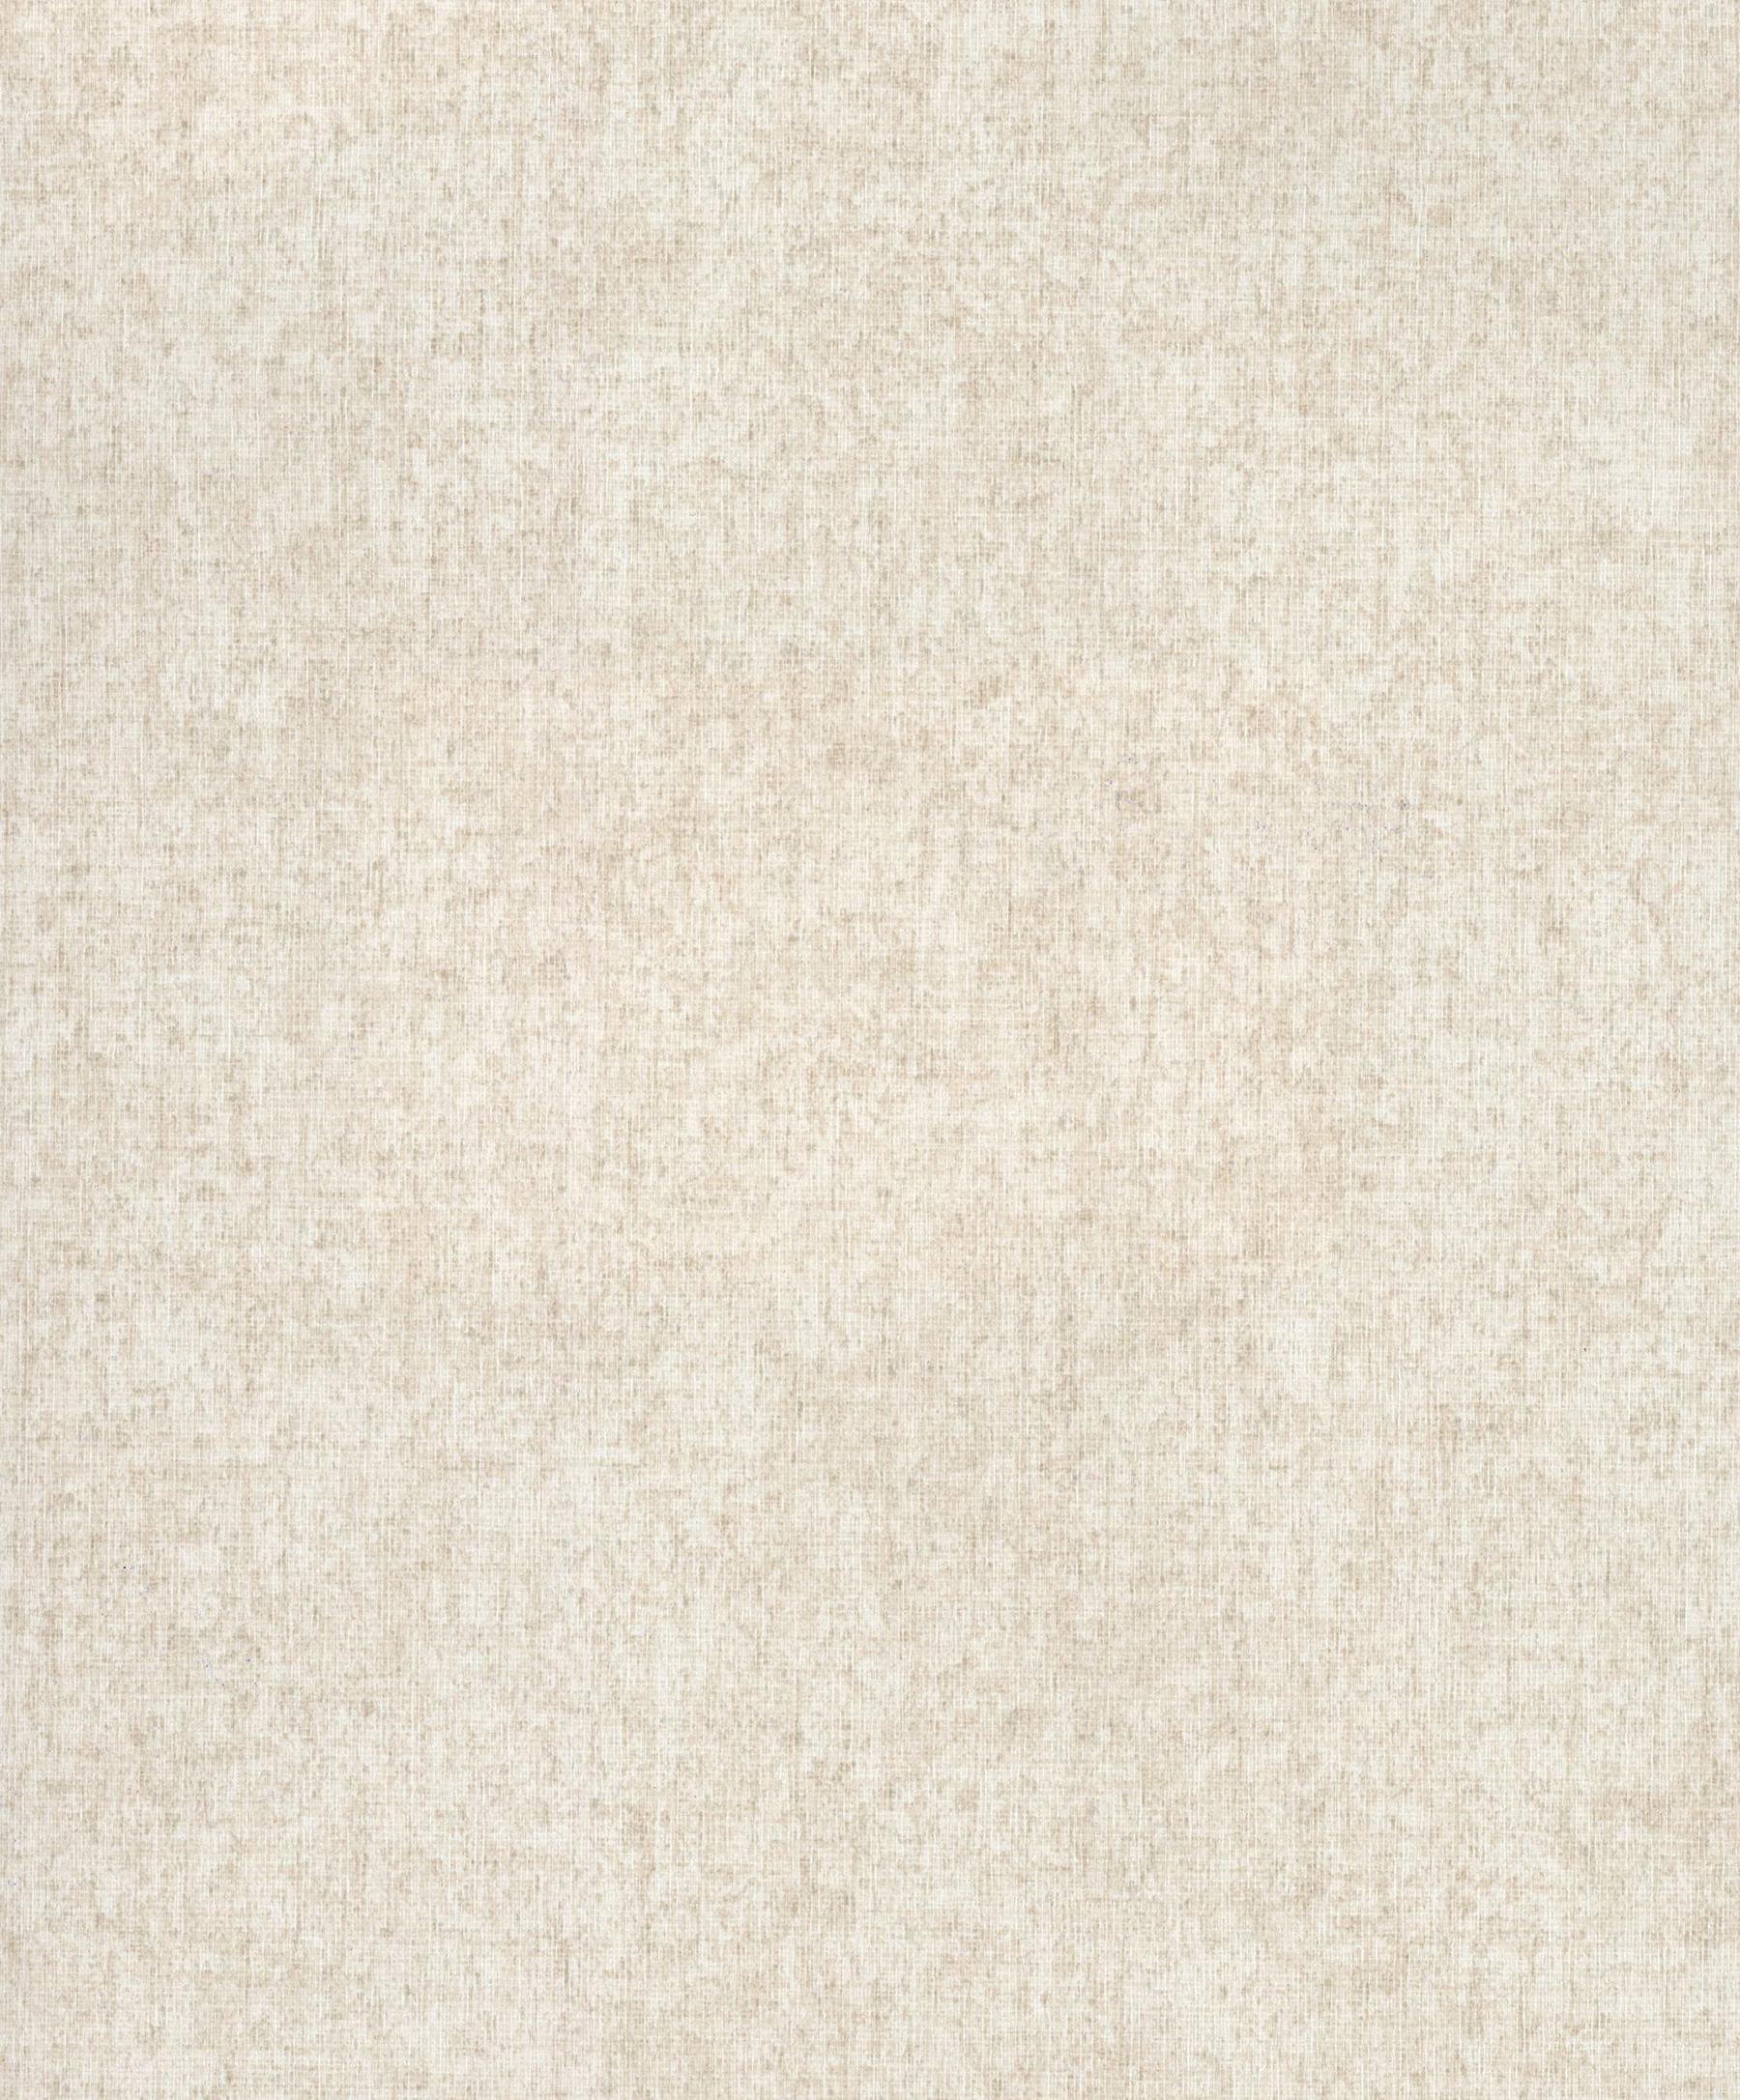 Picture of Brienne Neutral Linen Texture Wallpaper